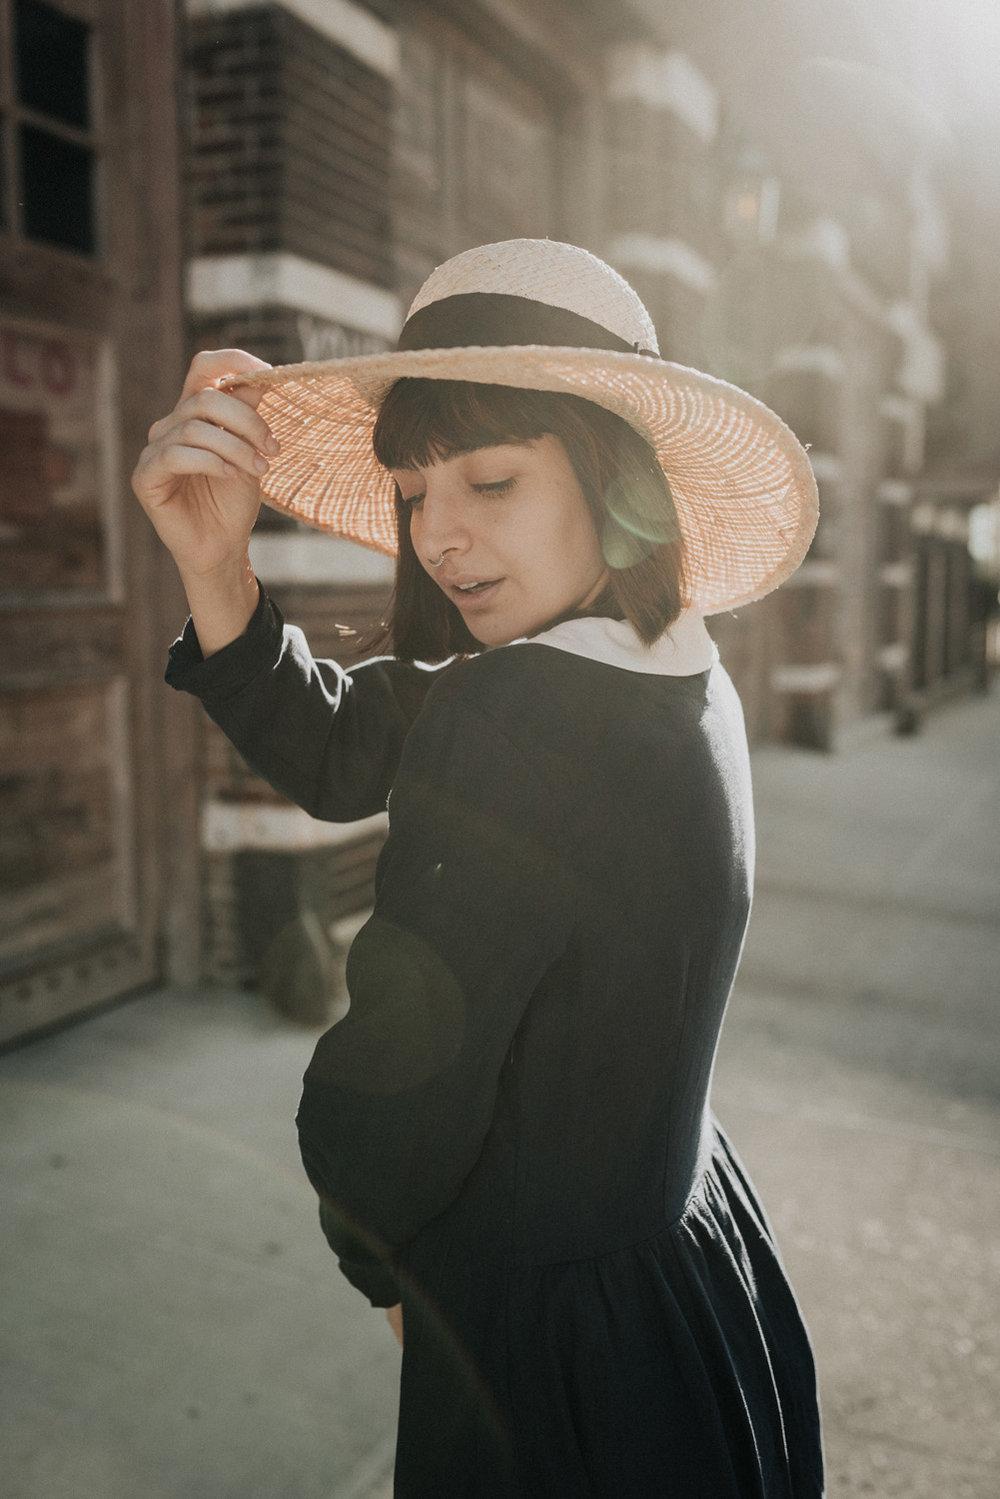 KyleWillisPhoto-Kyle-Willis-Photography-ClosetVomitFashion-Ashley-Ballard-Hanna-Walters-Demurela-New-York-City-Blogger-Sondeflor-Philadelphia-Soho-Portrait-Photographer-Lifestyle